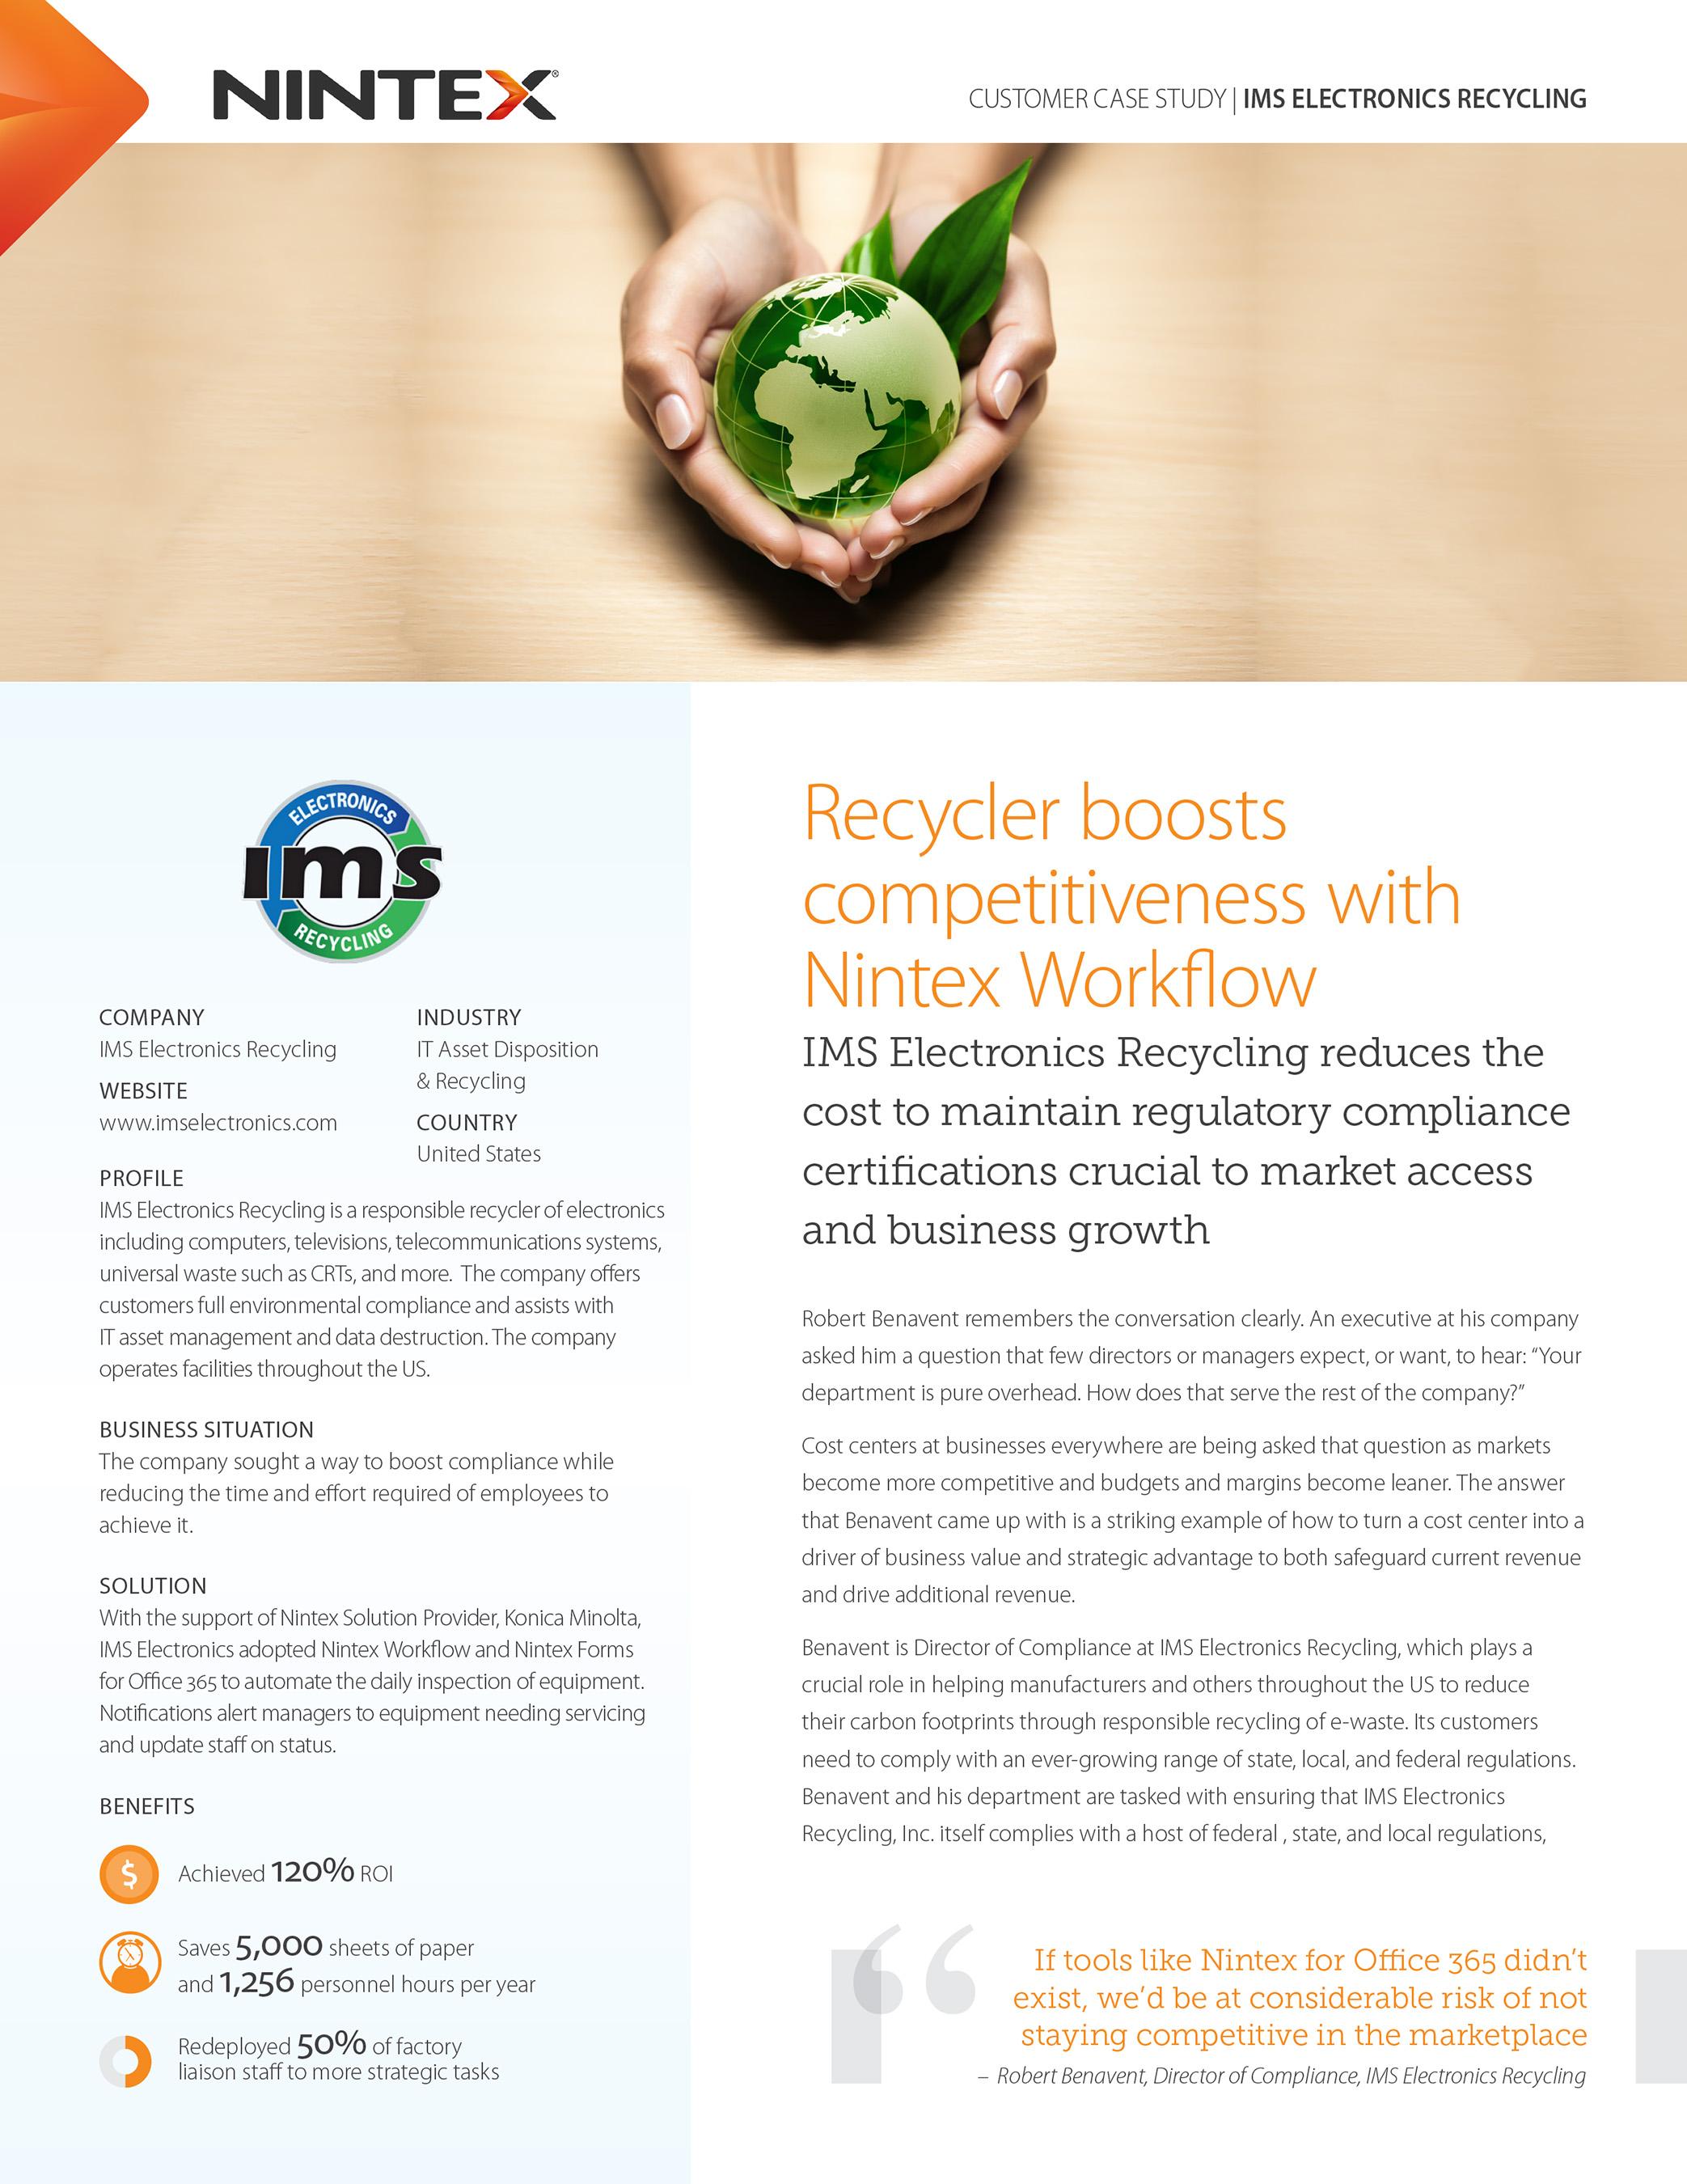 Case Study - IMS Electronics Recycling